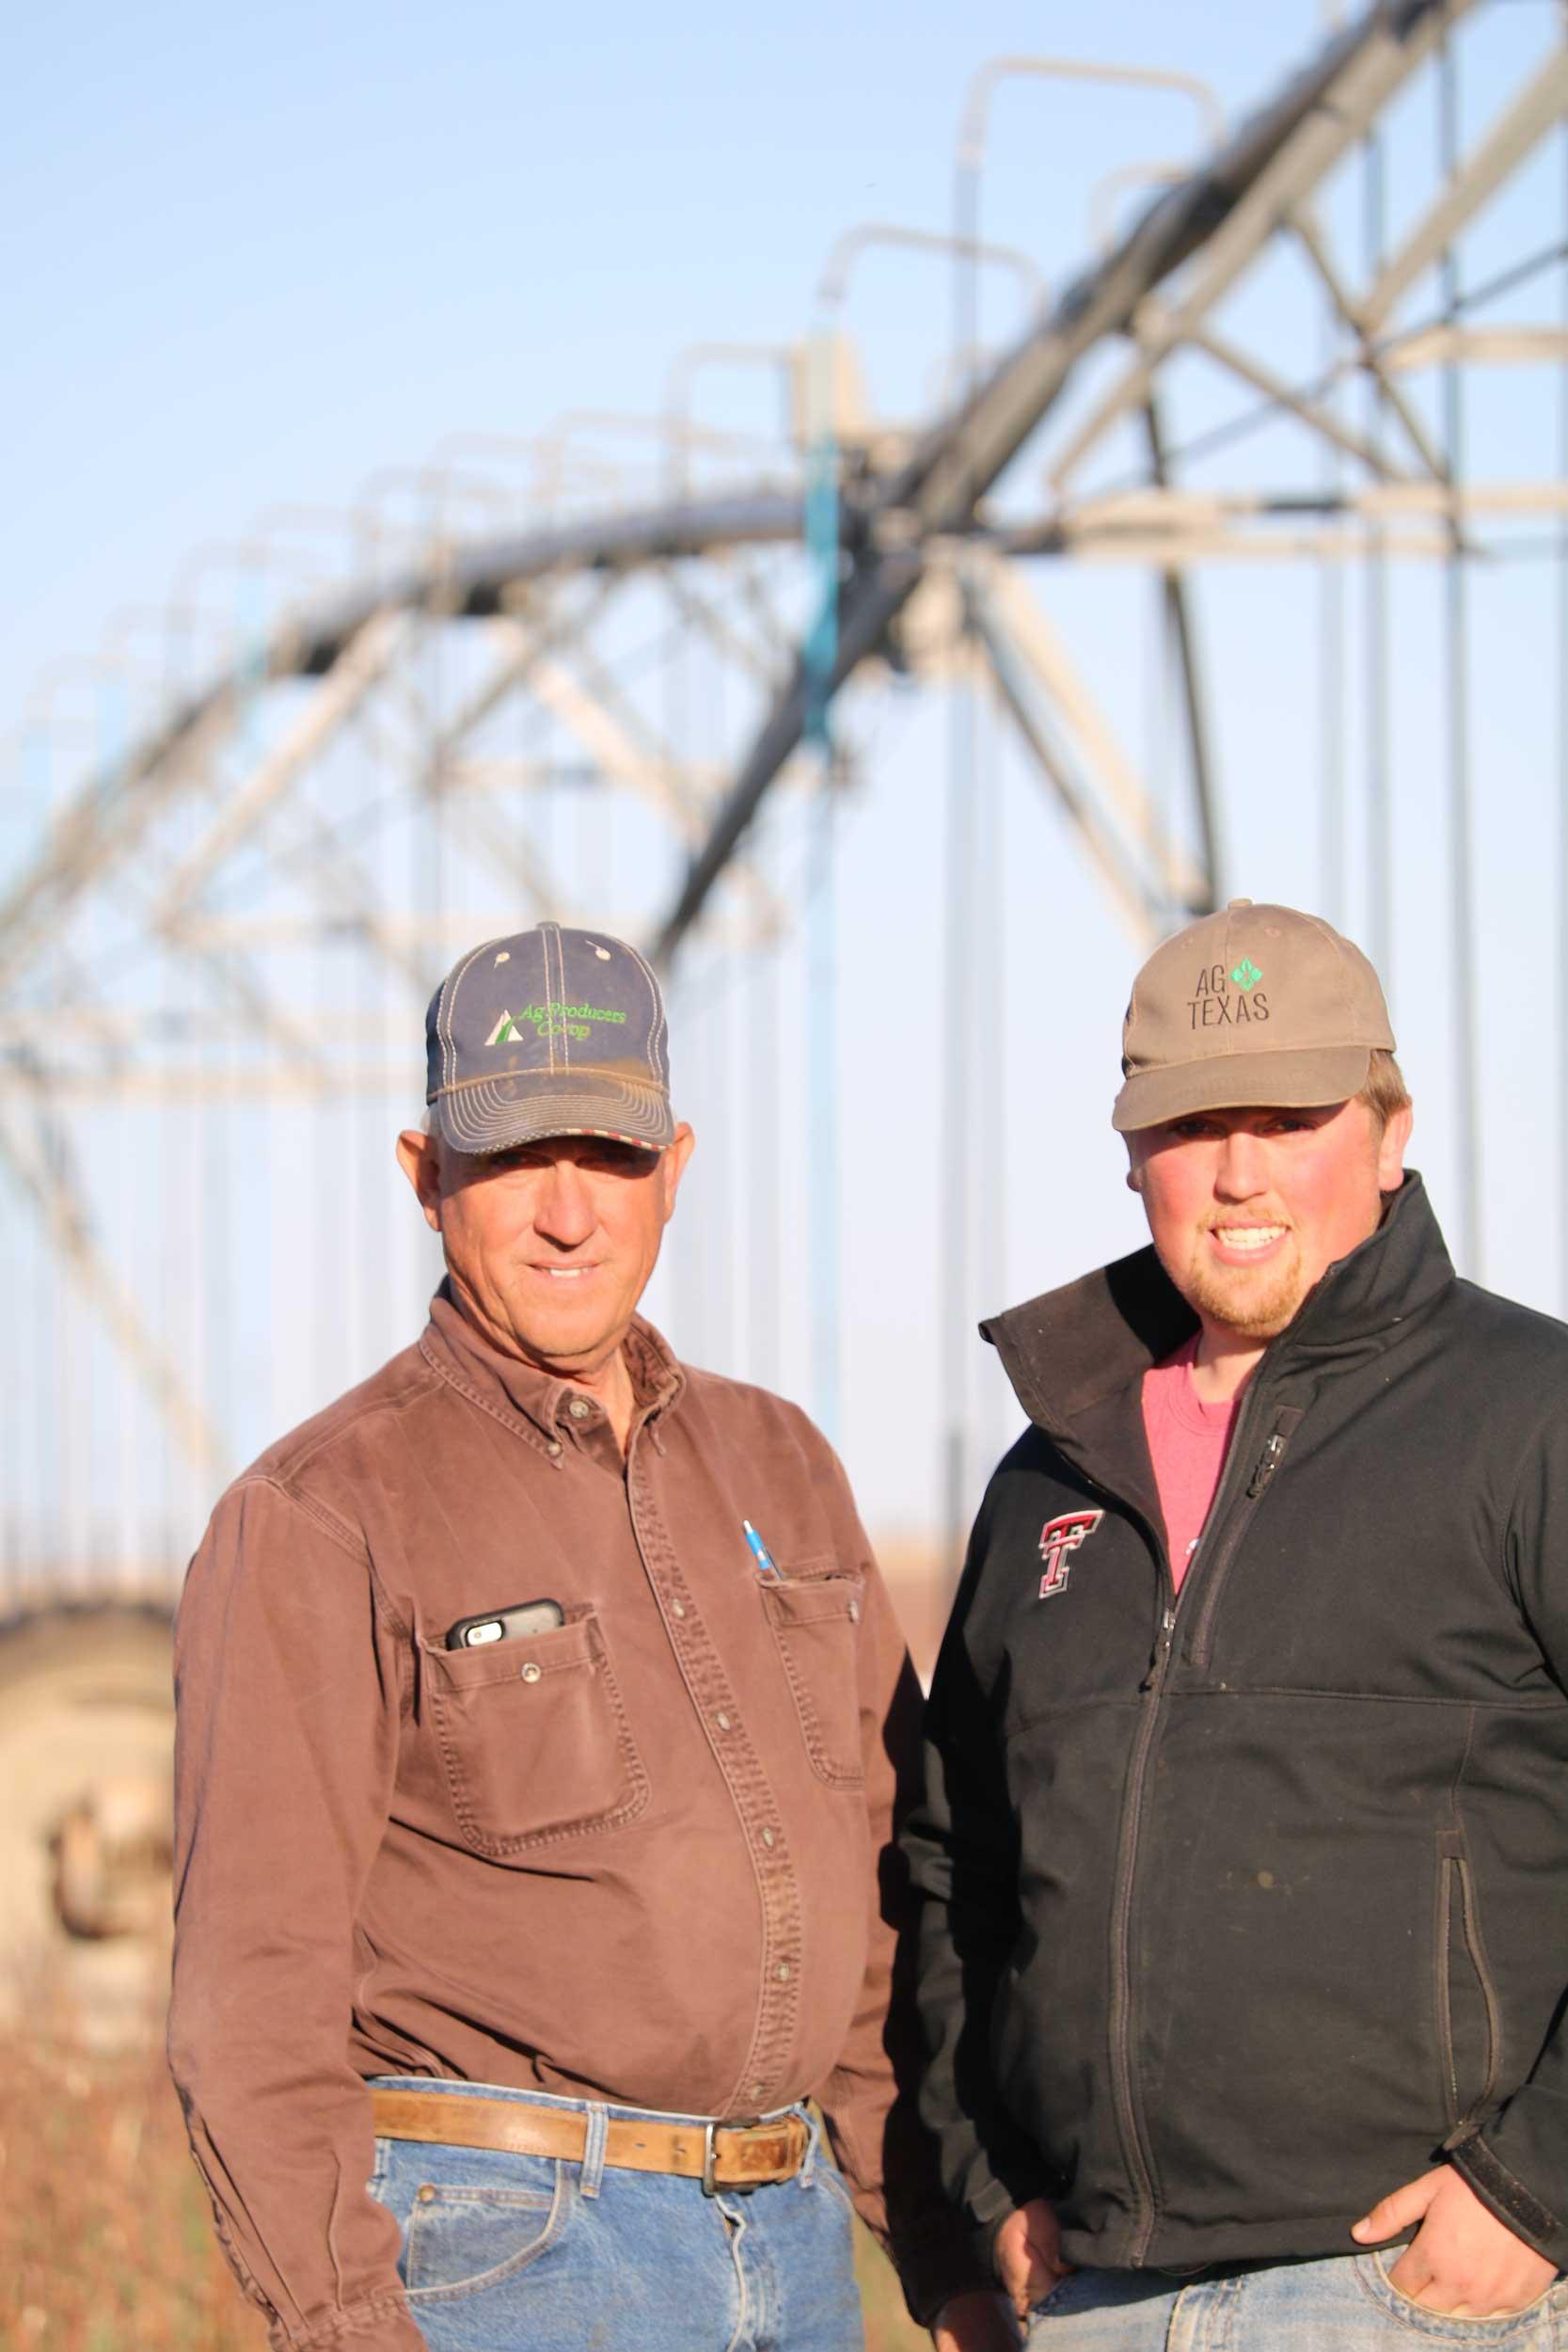 TAWC President Glenn Schur and his son Layton Schur on their farm located in Plainview Texas.